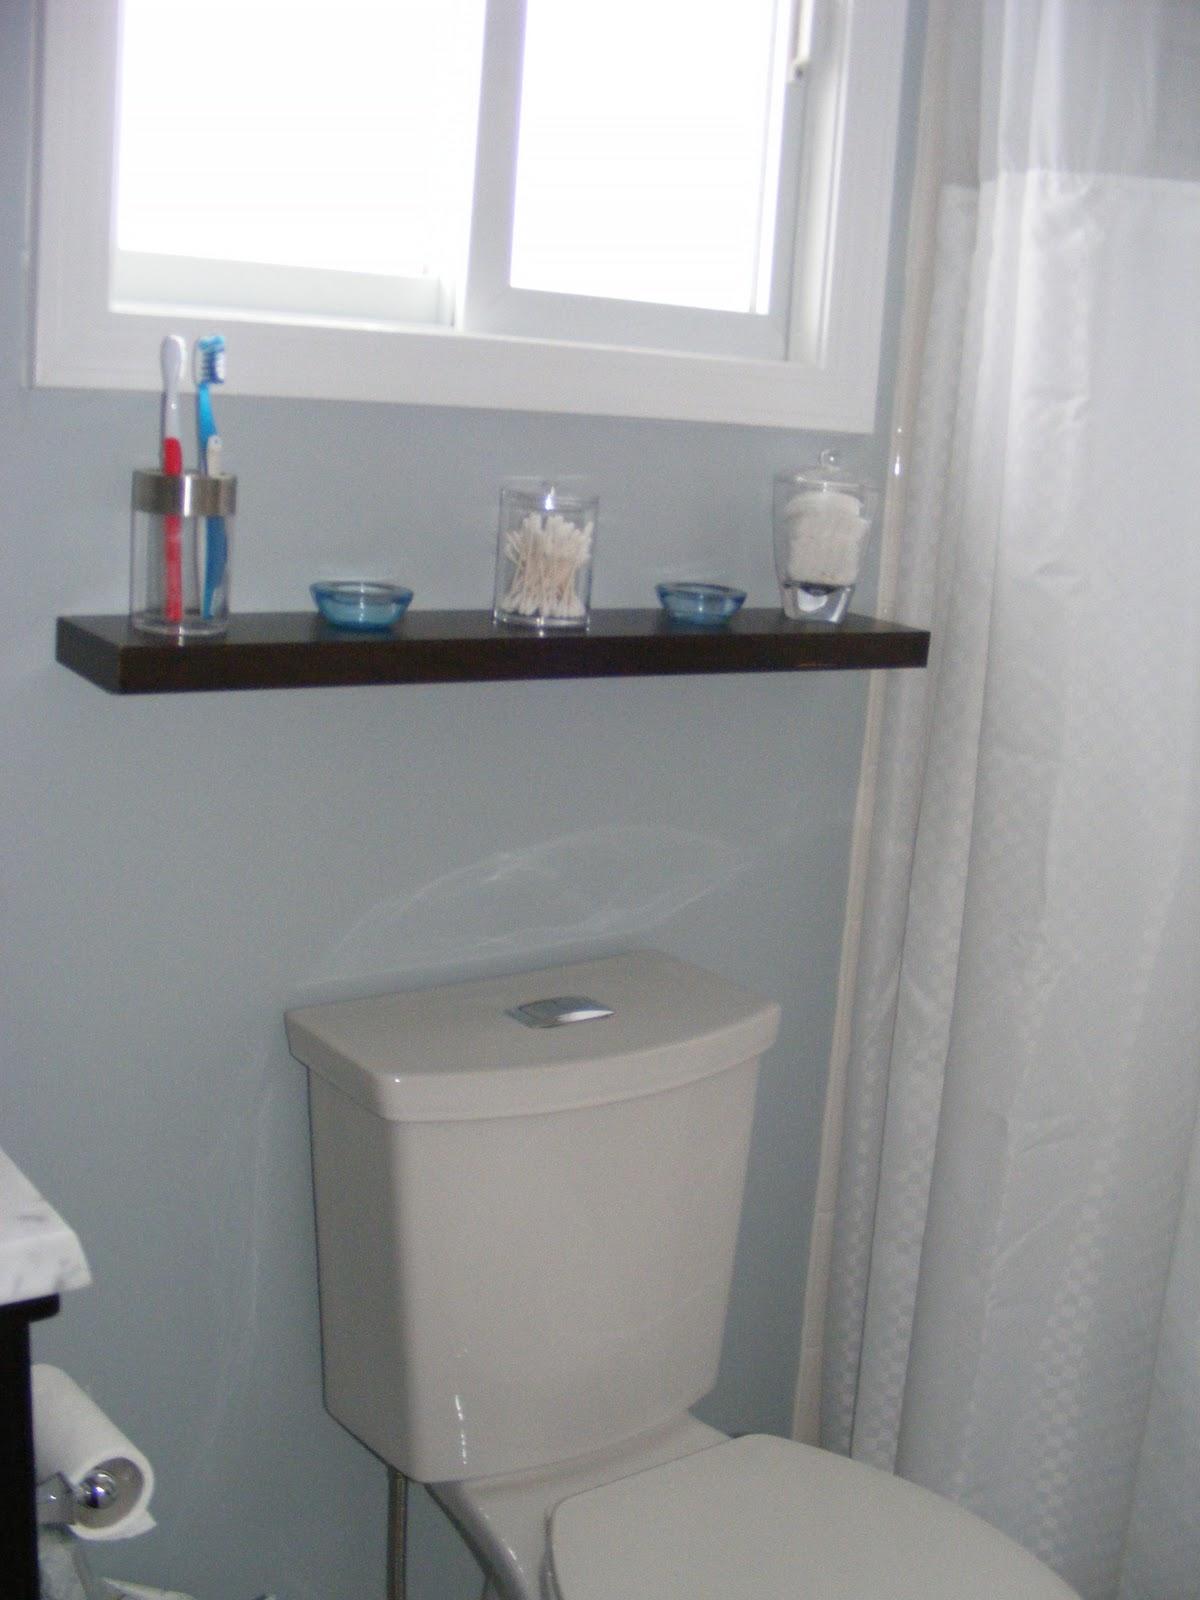 Floating Shelves Above Toilet 21 Image Wall Shelves